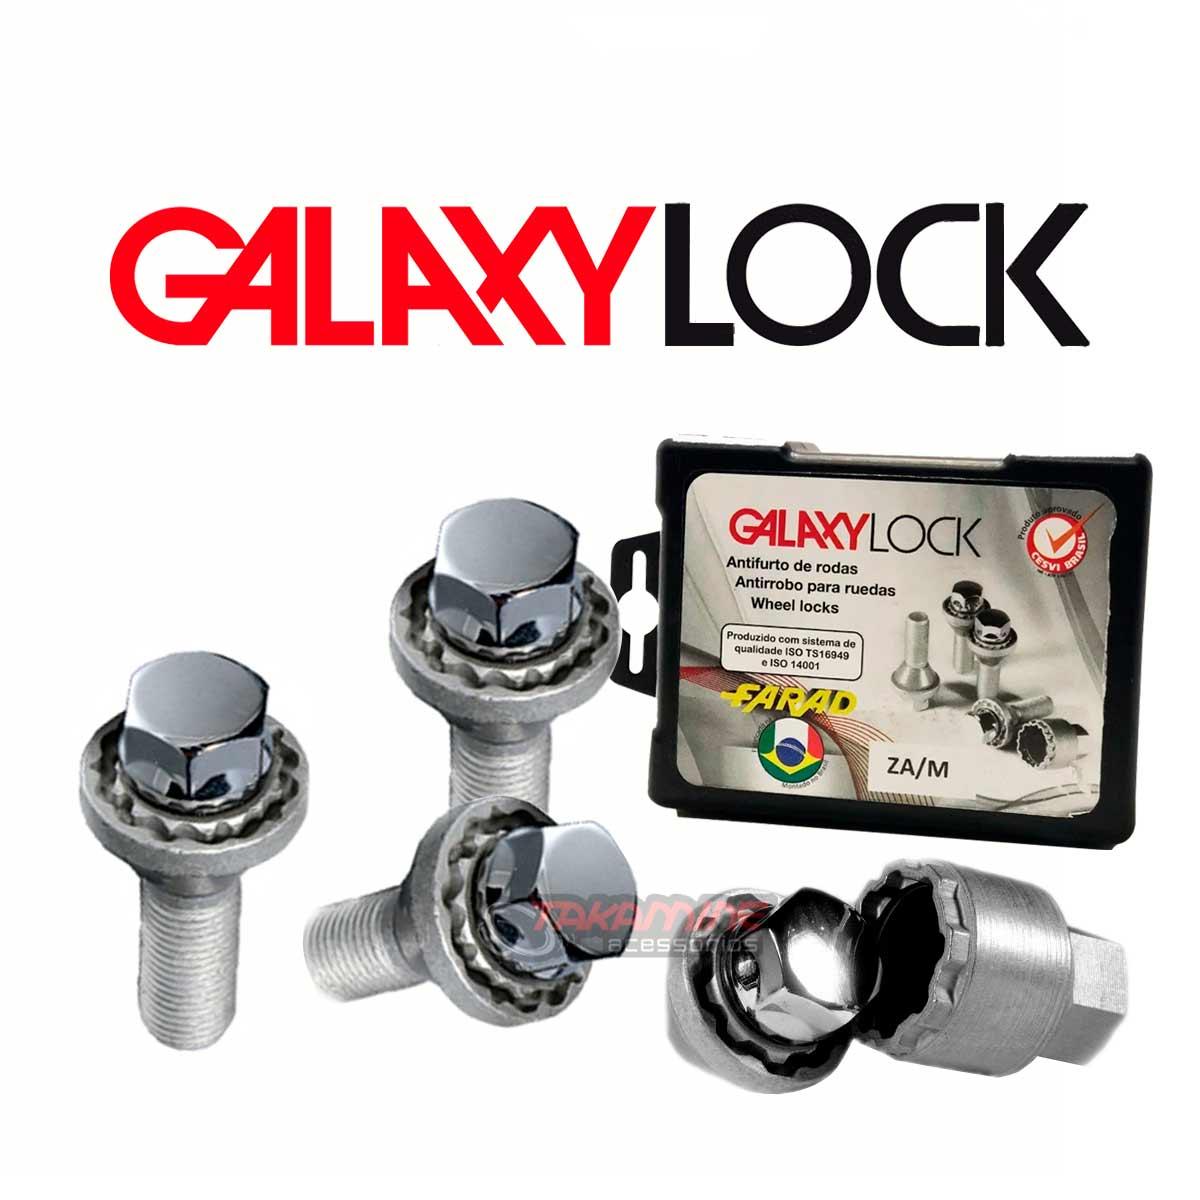 Parafuso antifurto para rodas Galaxy Lock Tiggo 5 (roda de liga)